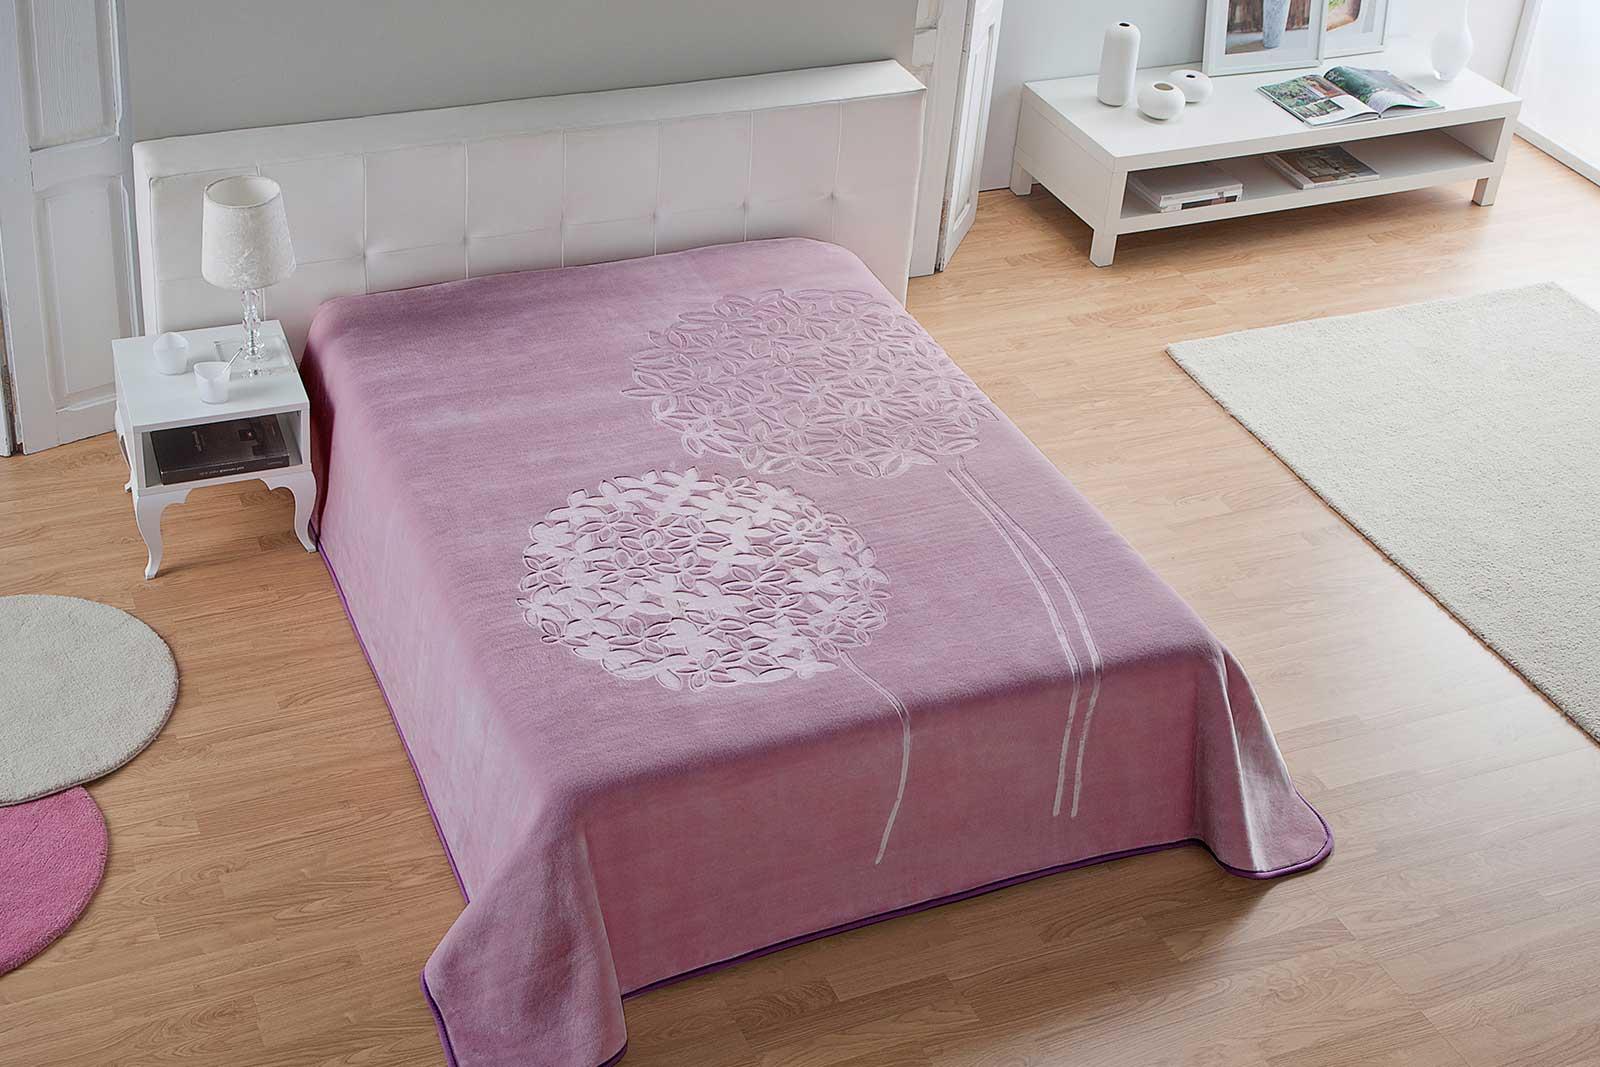 Baby Pink Color Blanket